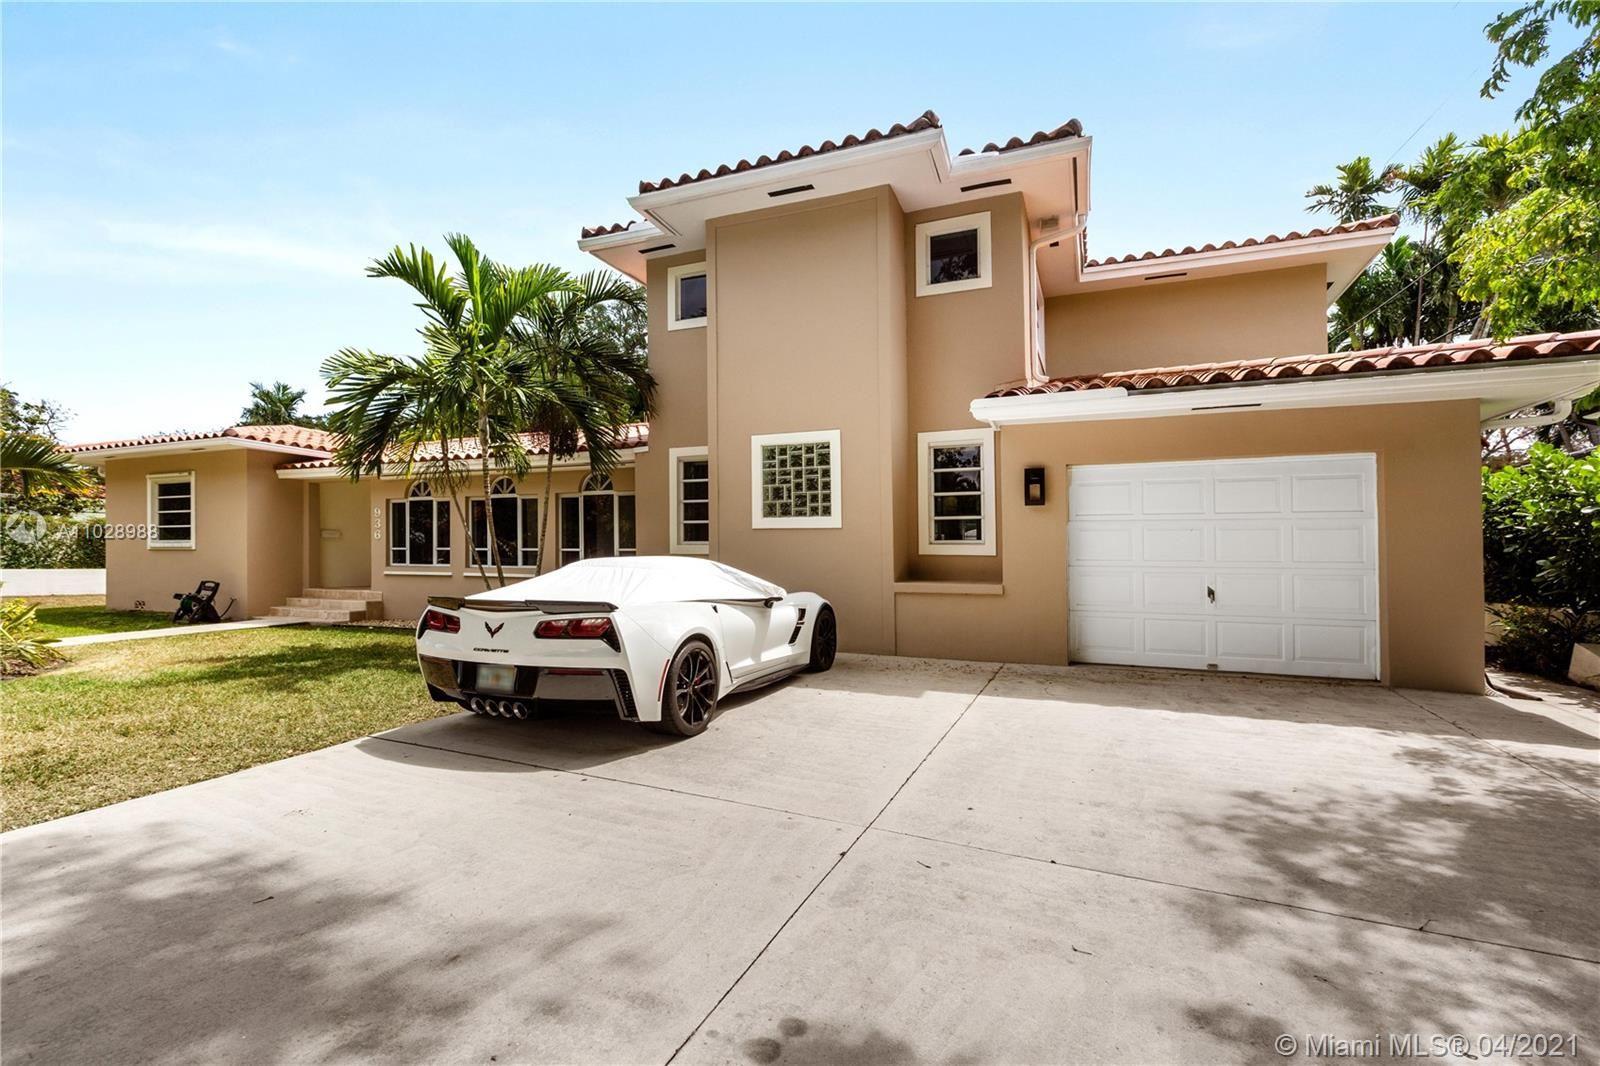 Photo of 936 N Algaringo Ave, Coral Gables, FL 33134 (MLS # A11028988)